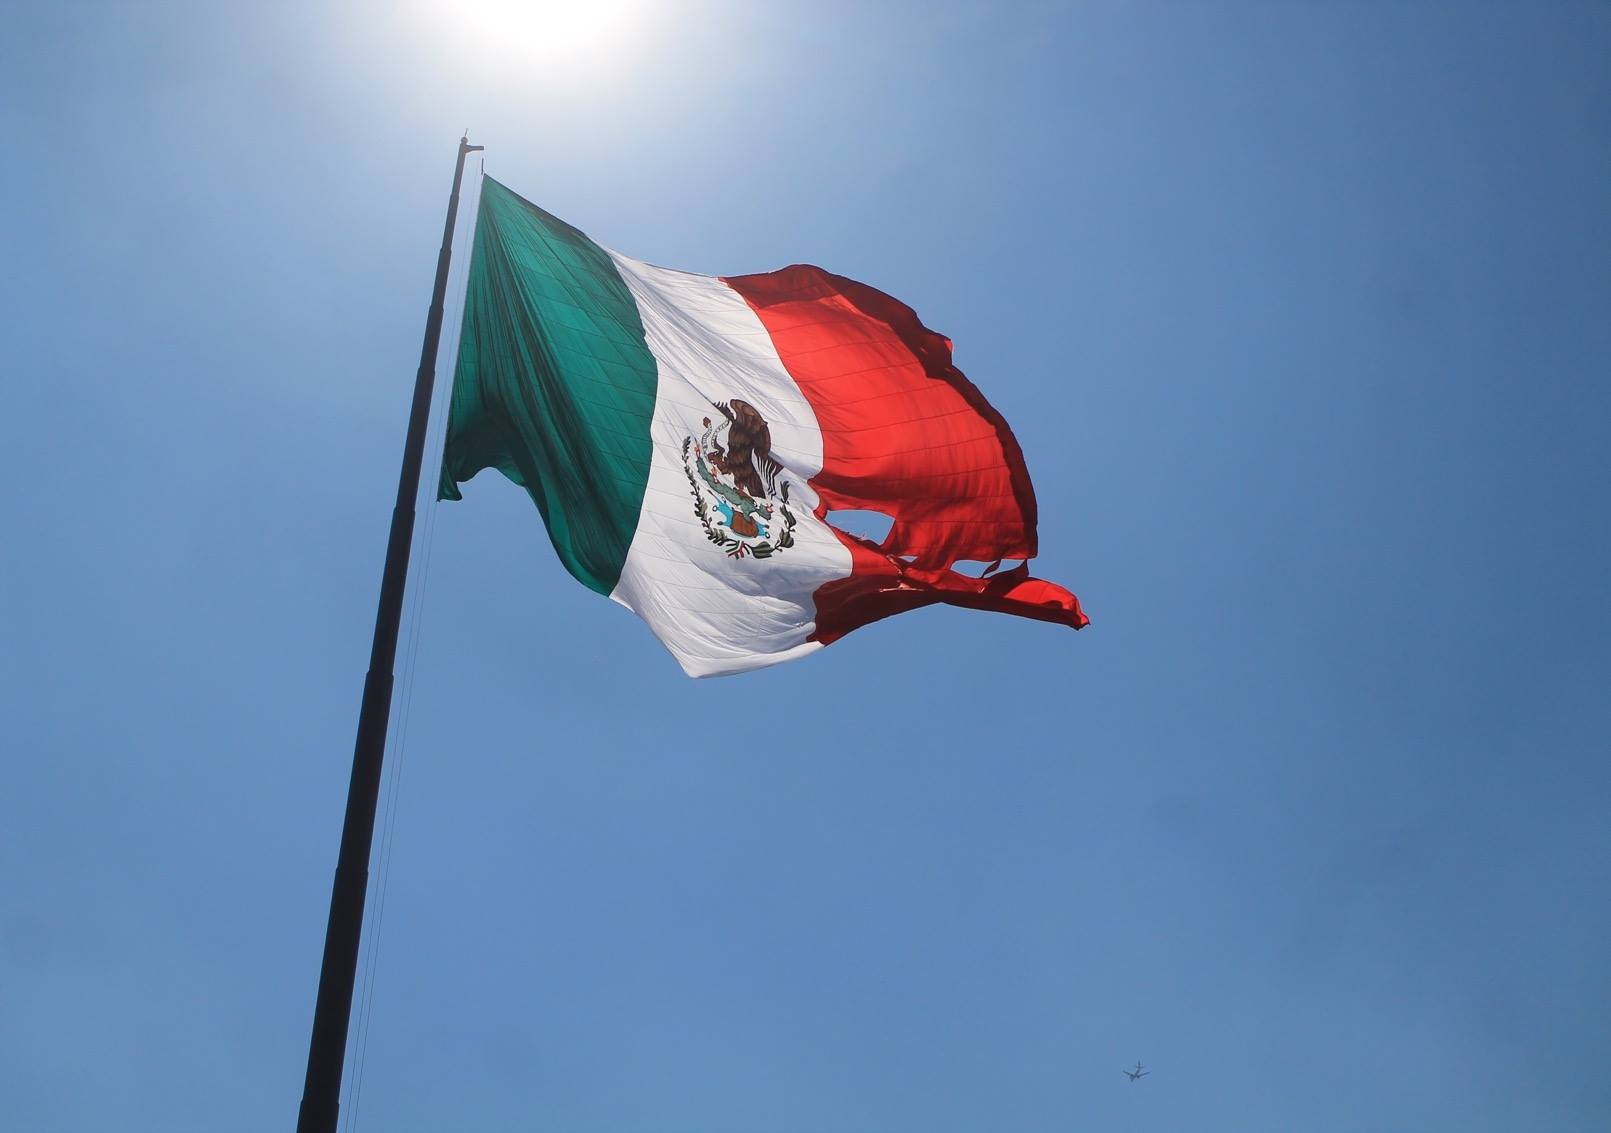 Se rasga la bandera del Campo Marte frente a Peña Nieto